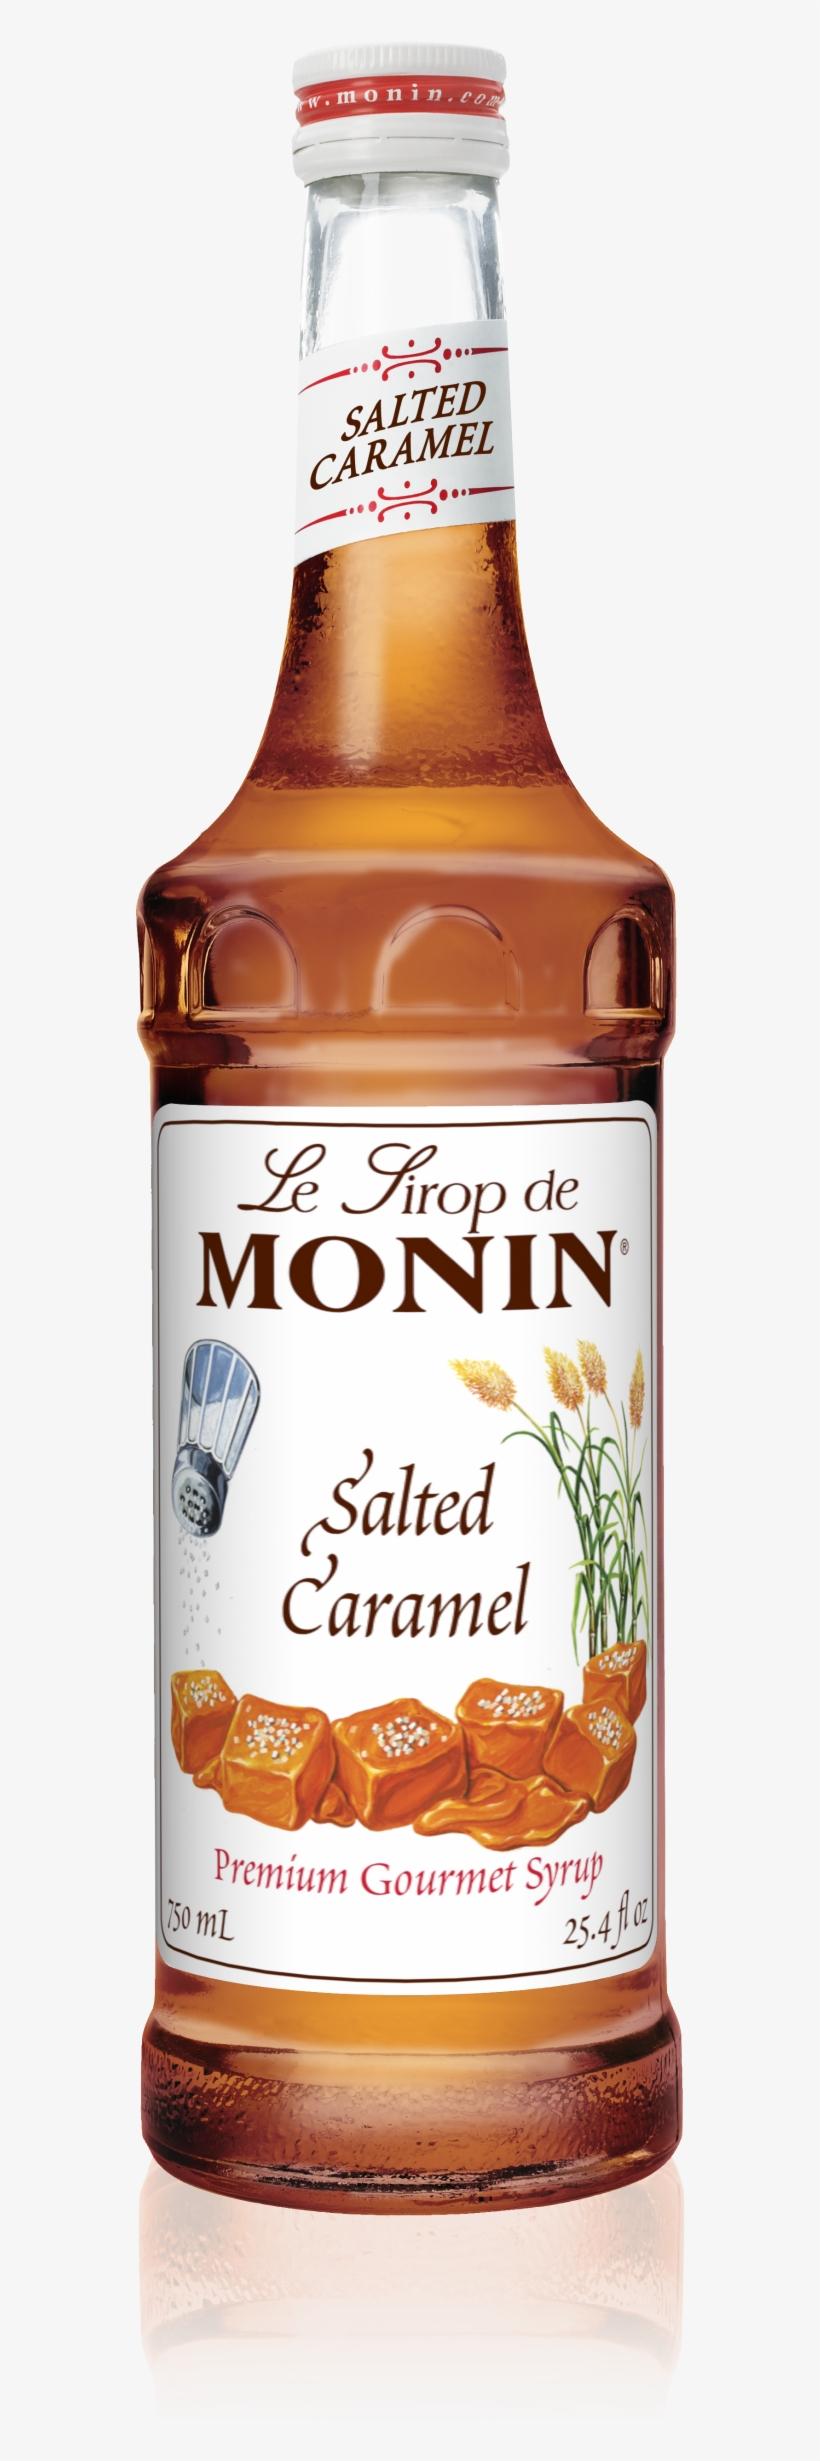 750 Ml Salted Caramel Syrup - Monin 750 Ml Premium Salted Caramel Flavoring Syrup, transparent png #1761302